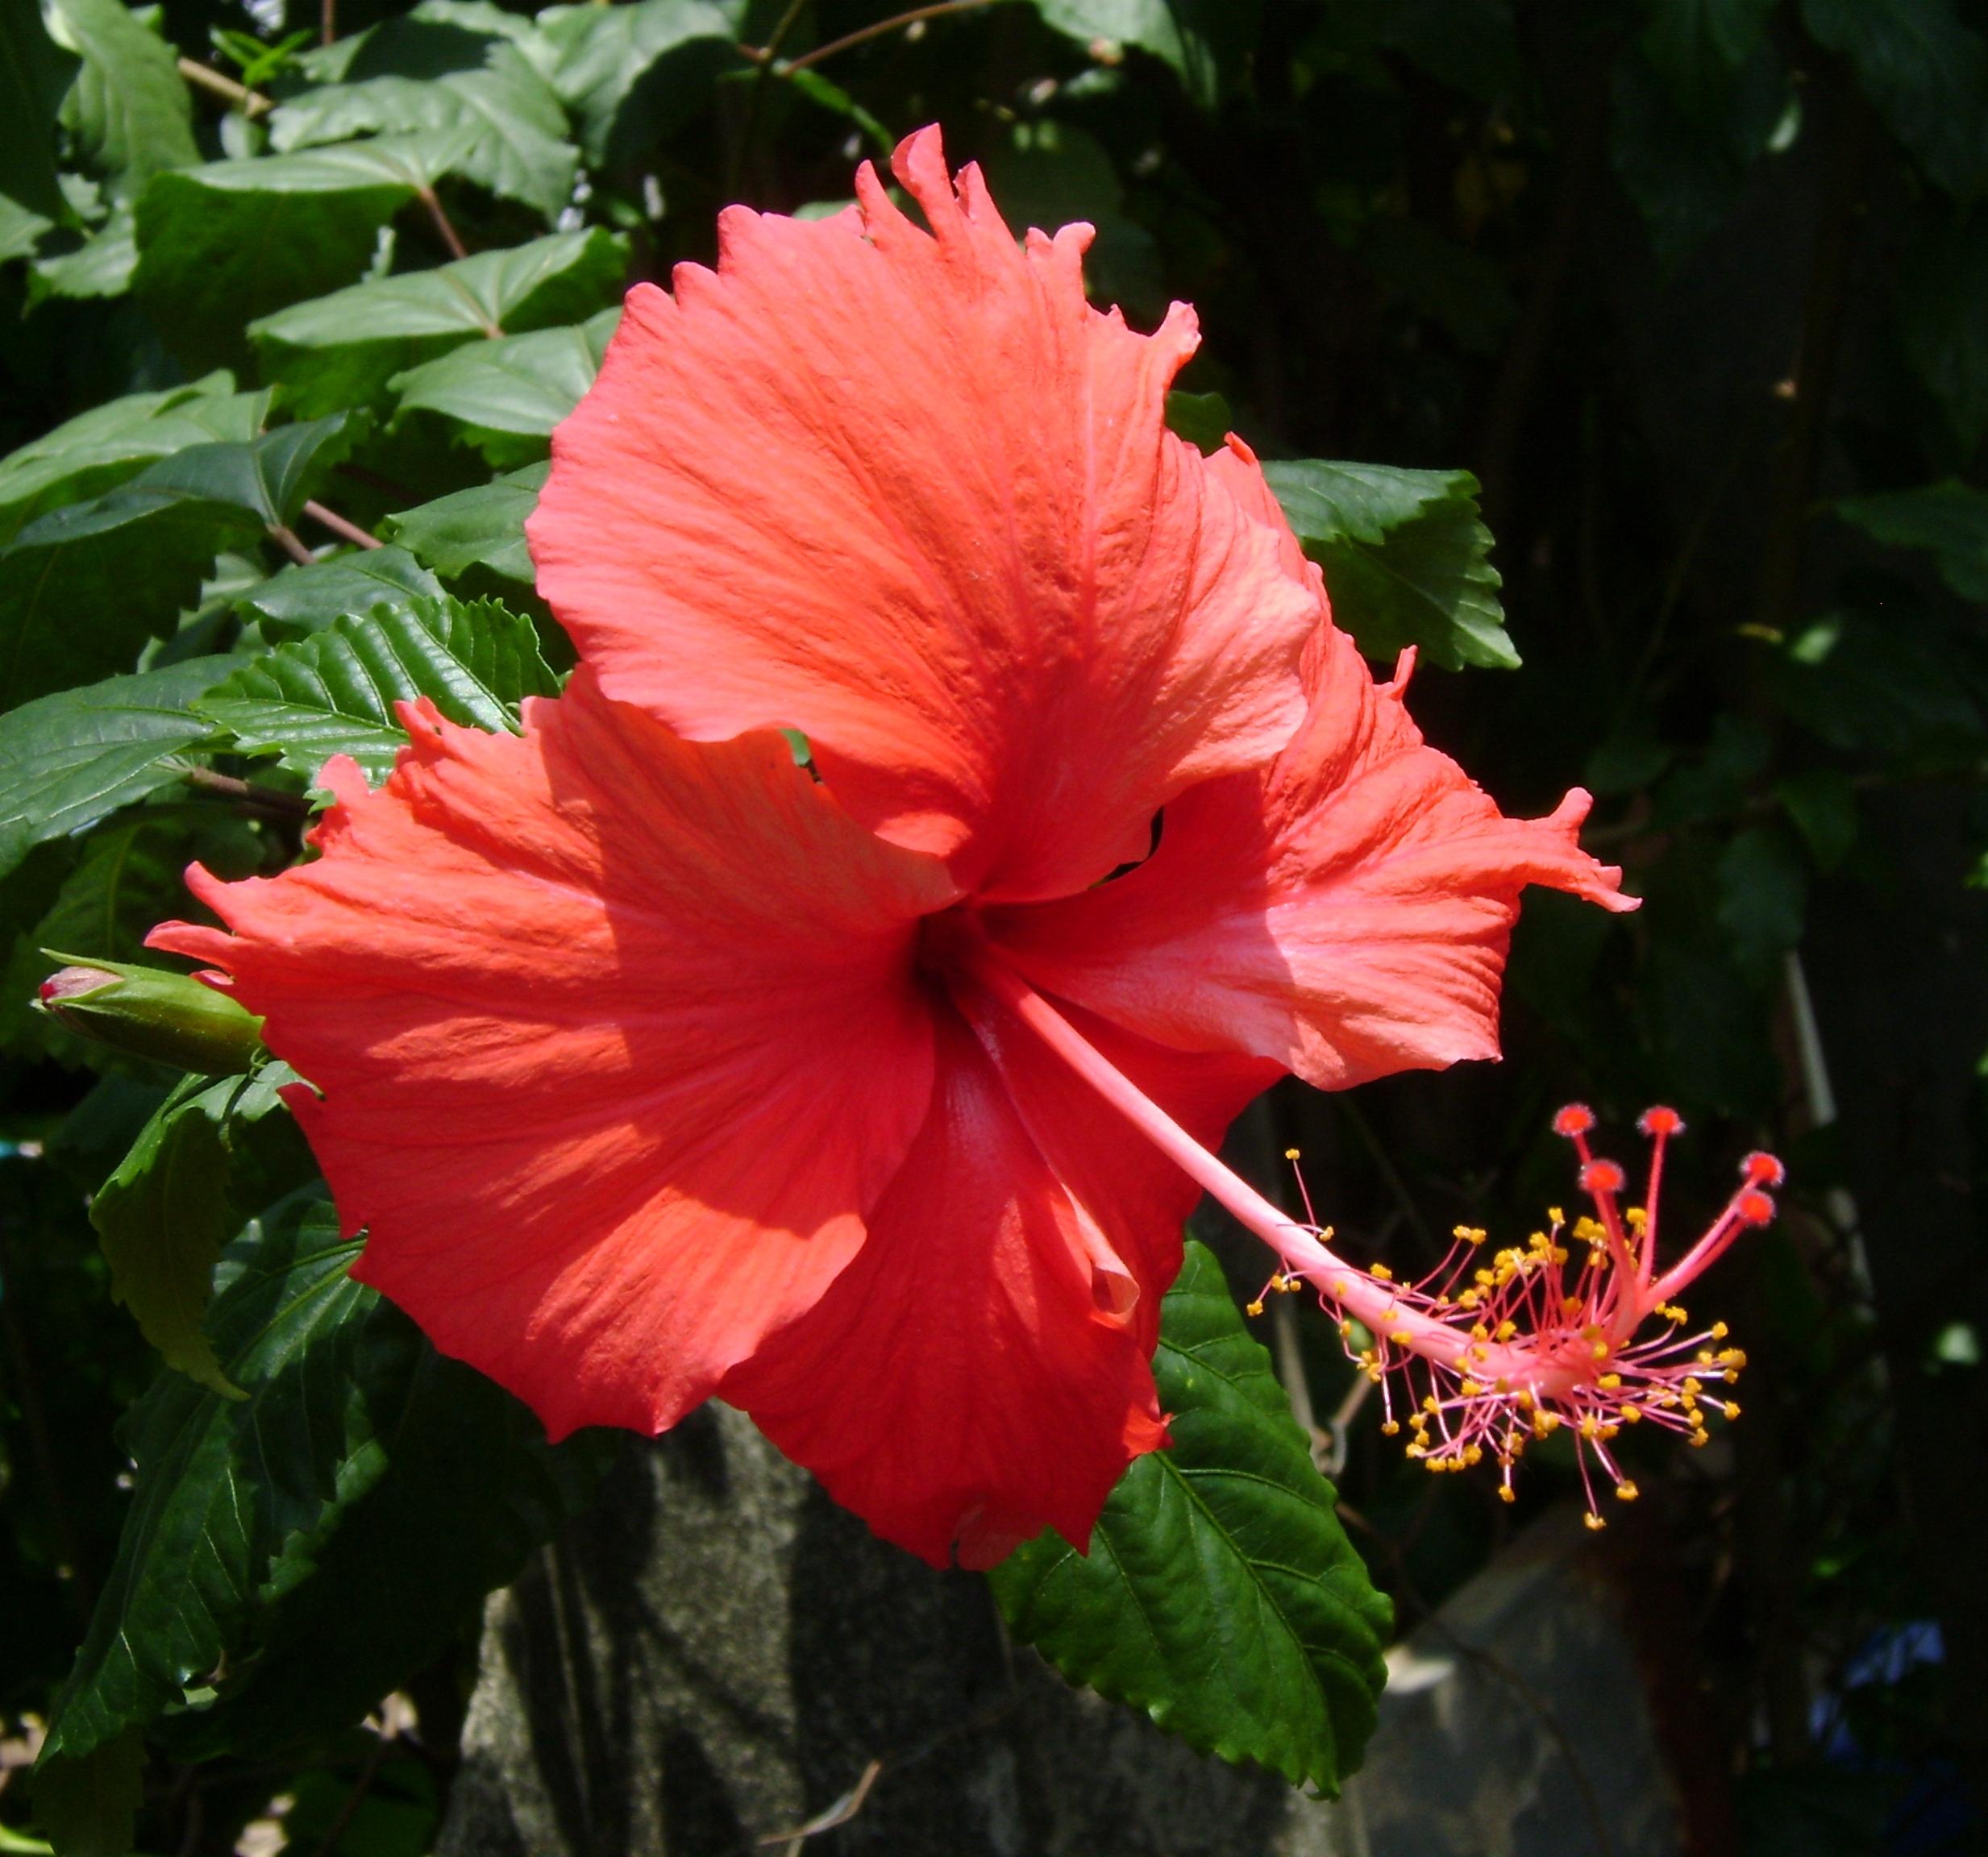 File:Vietnamese Hibiscus (Hoa râm bụt).JPG - Wikimedia Commons